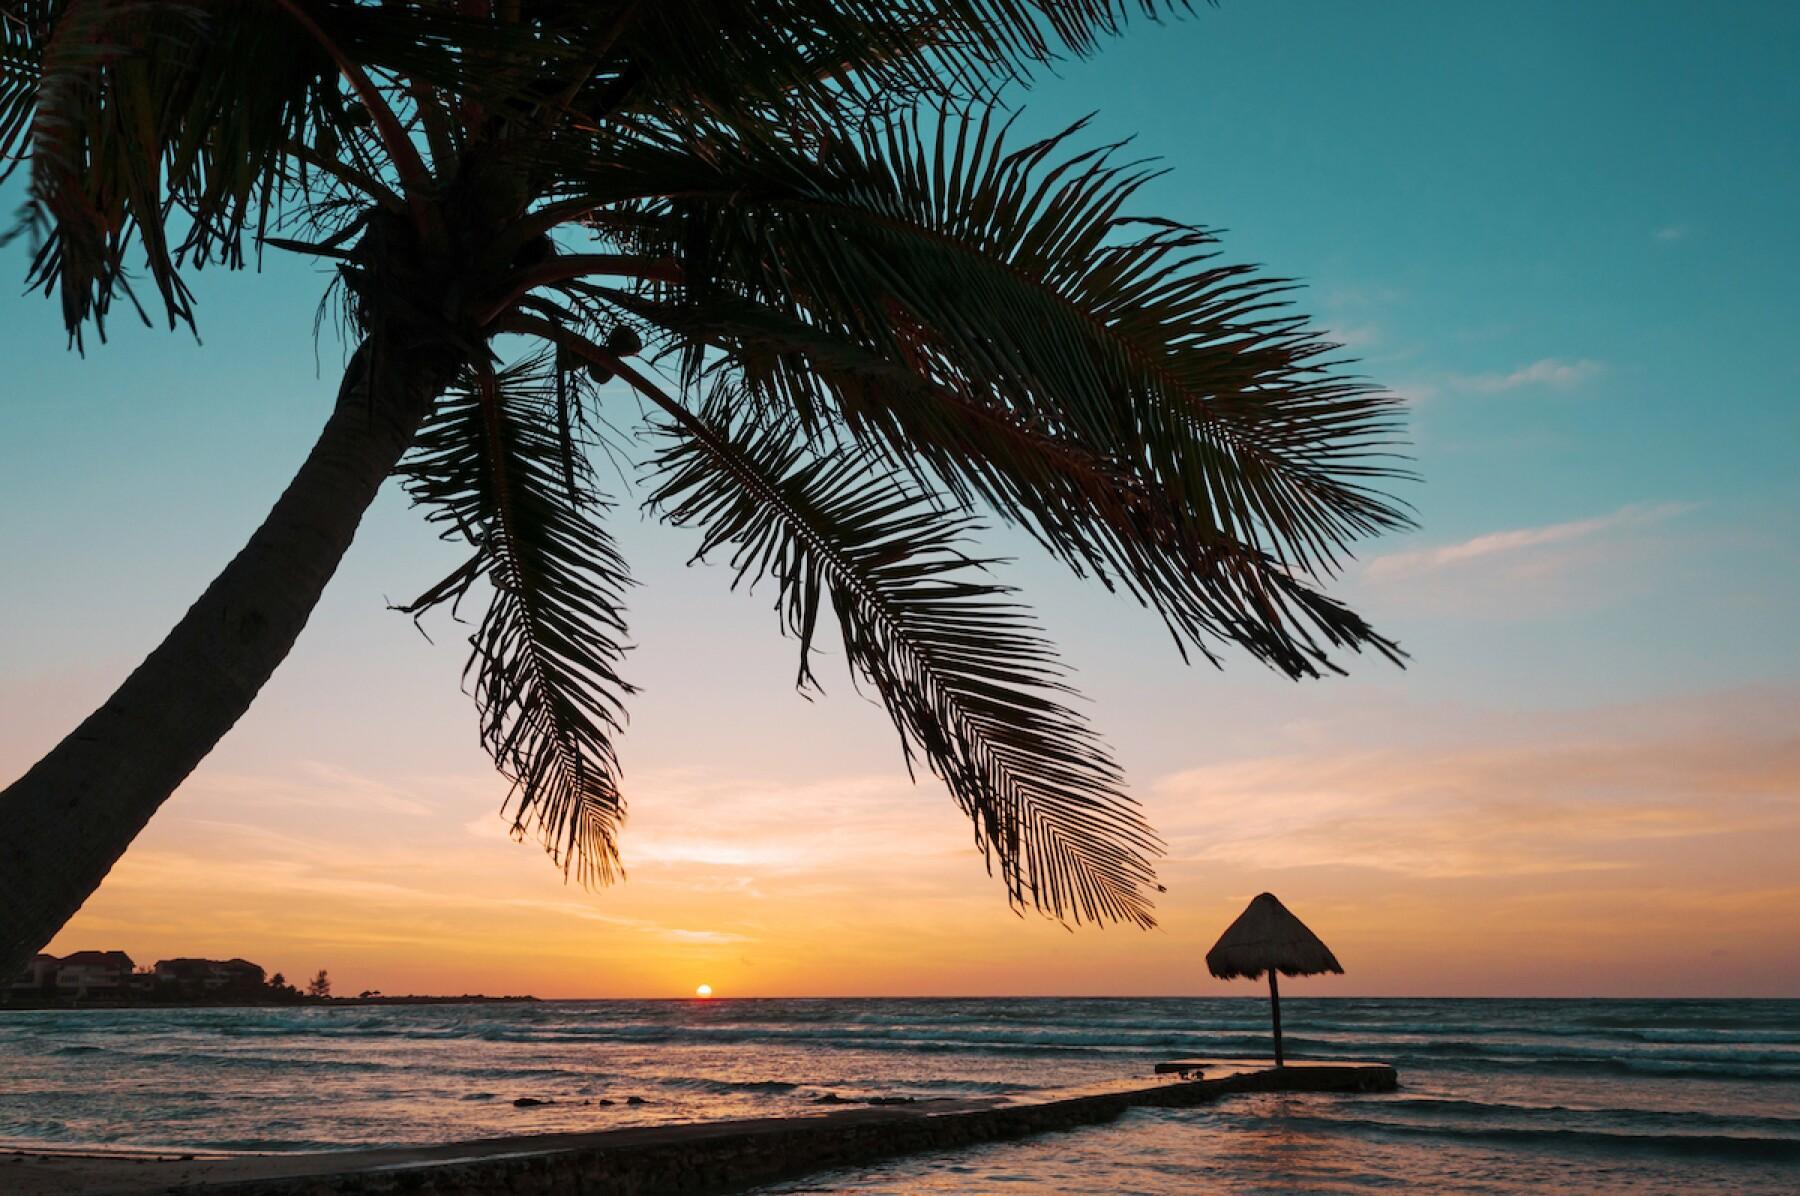 Palapa and palm tree on tropical beach at sunrise, Mayan Riviera, Mexico, Puerto Aventuras